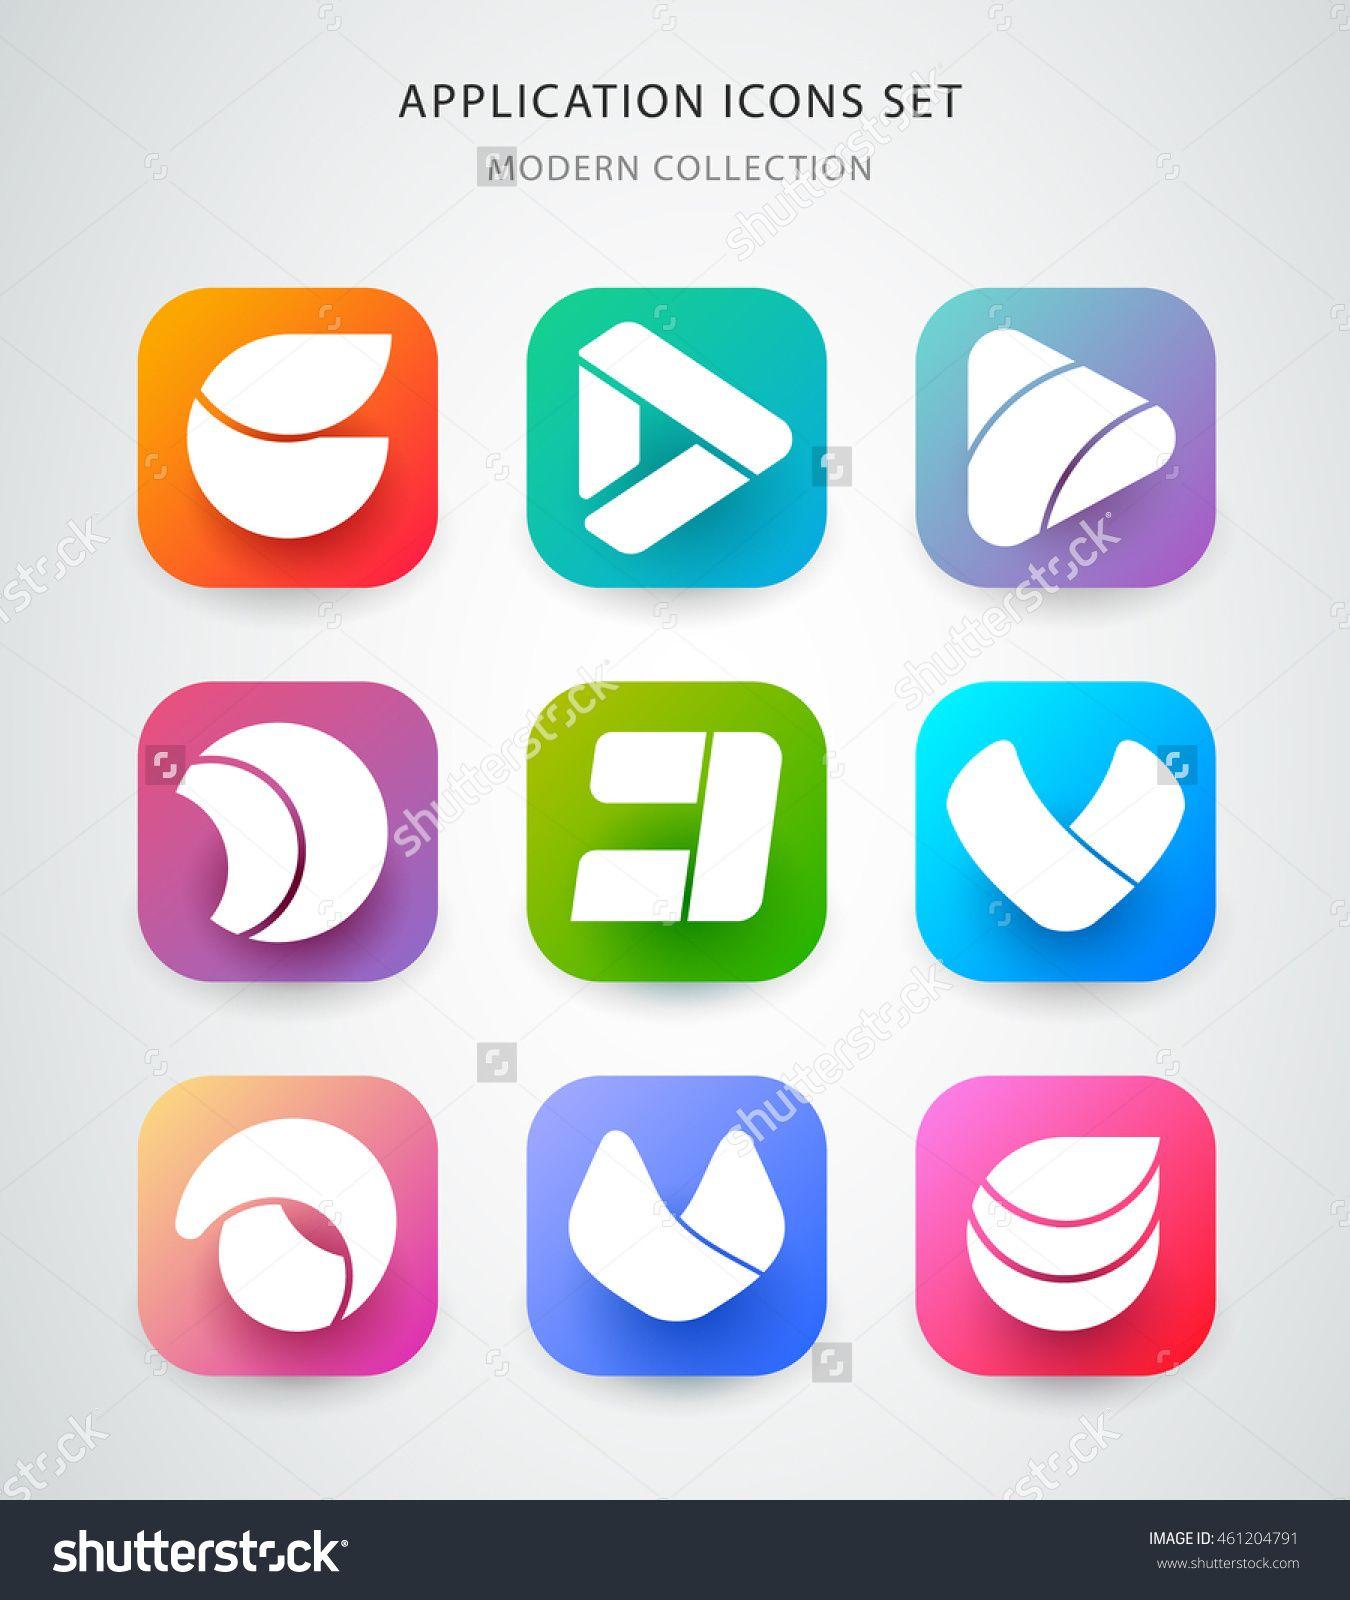 big vector icons set for application logo icon design app